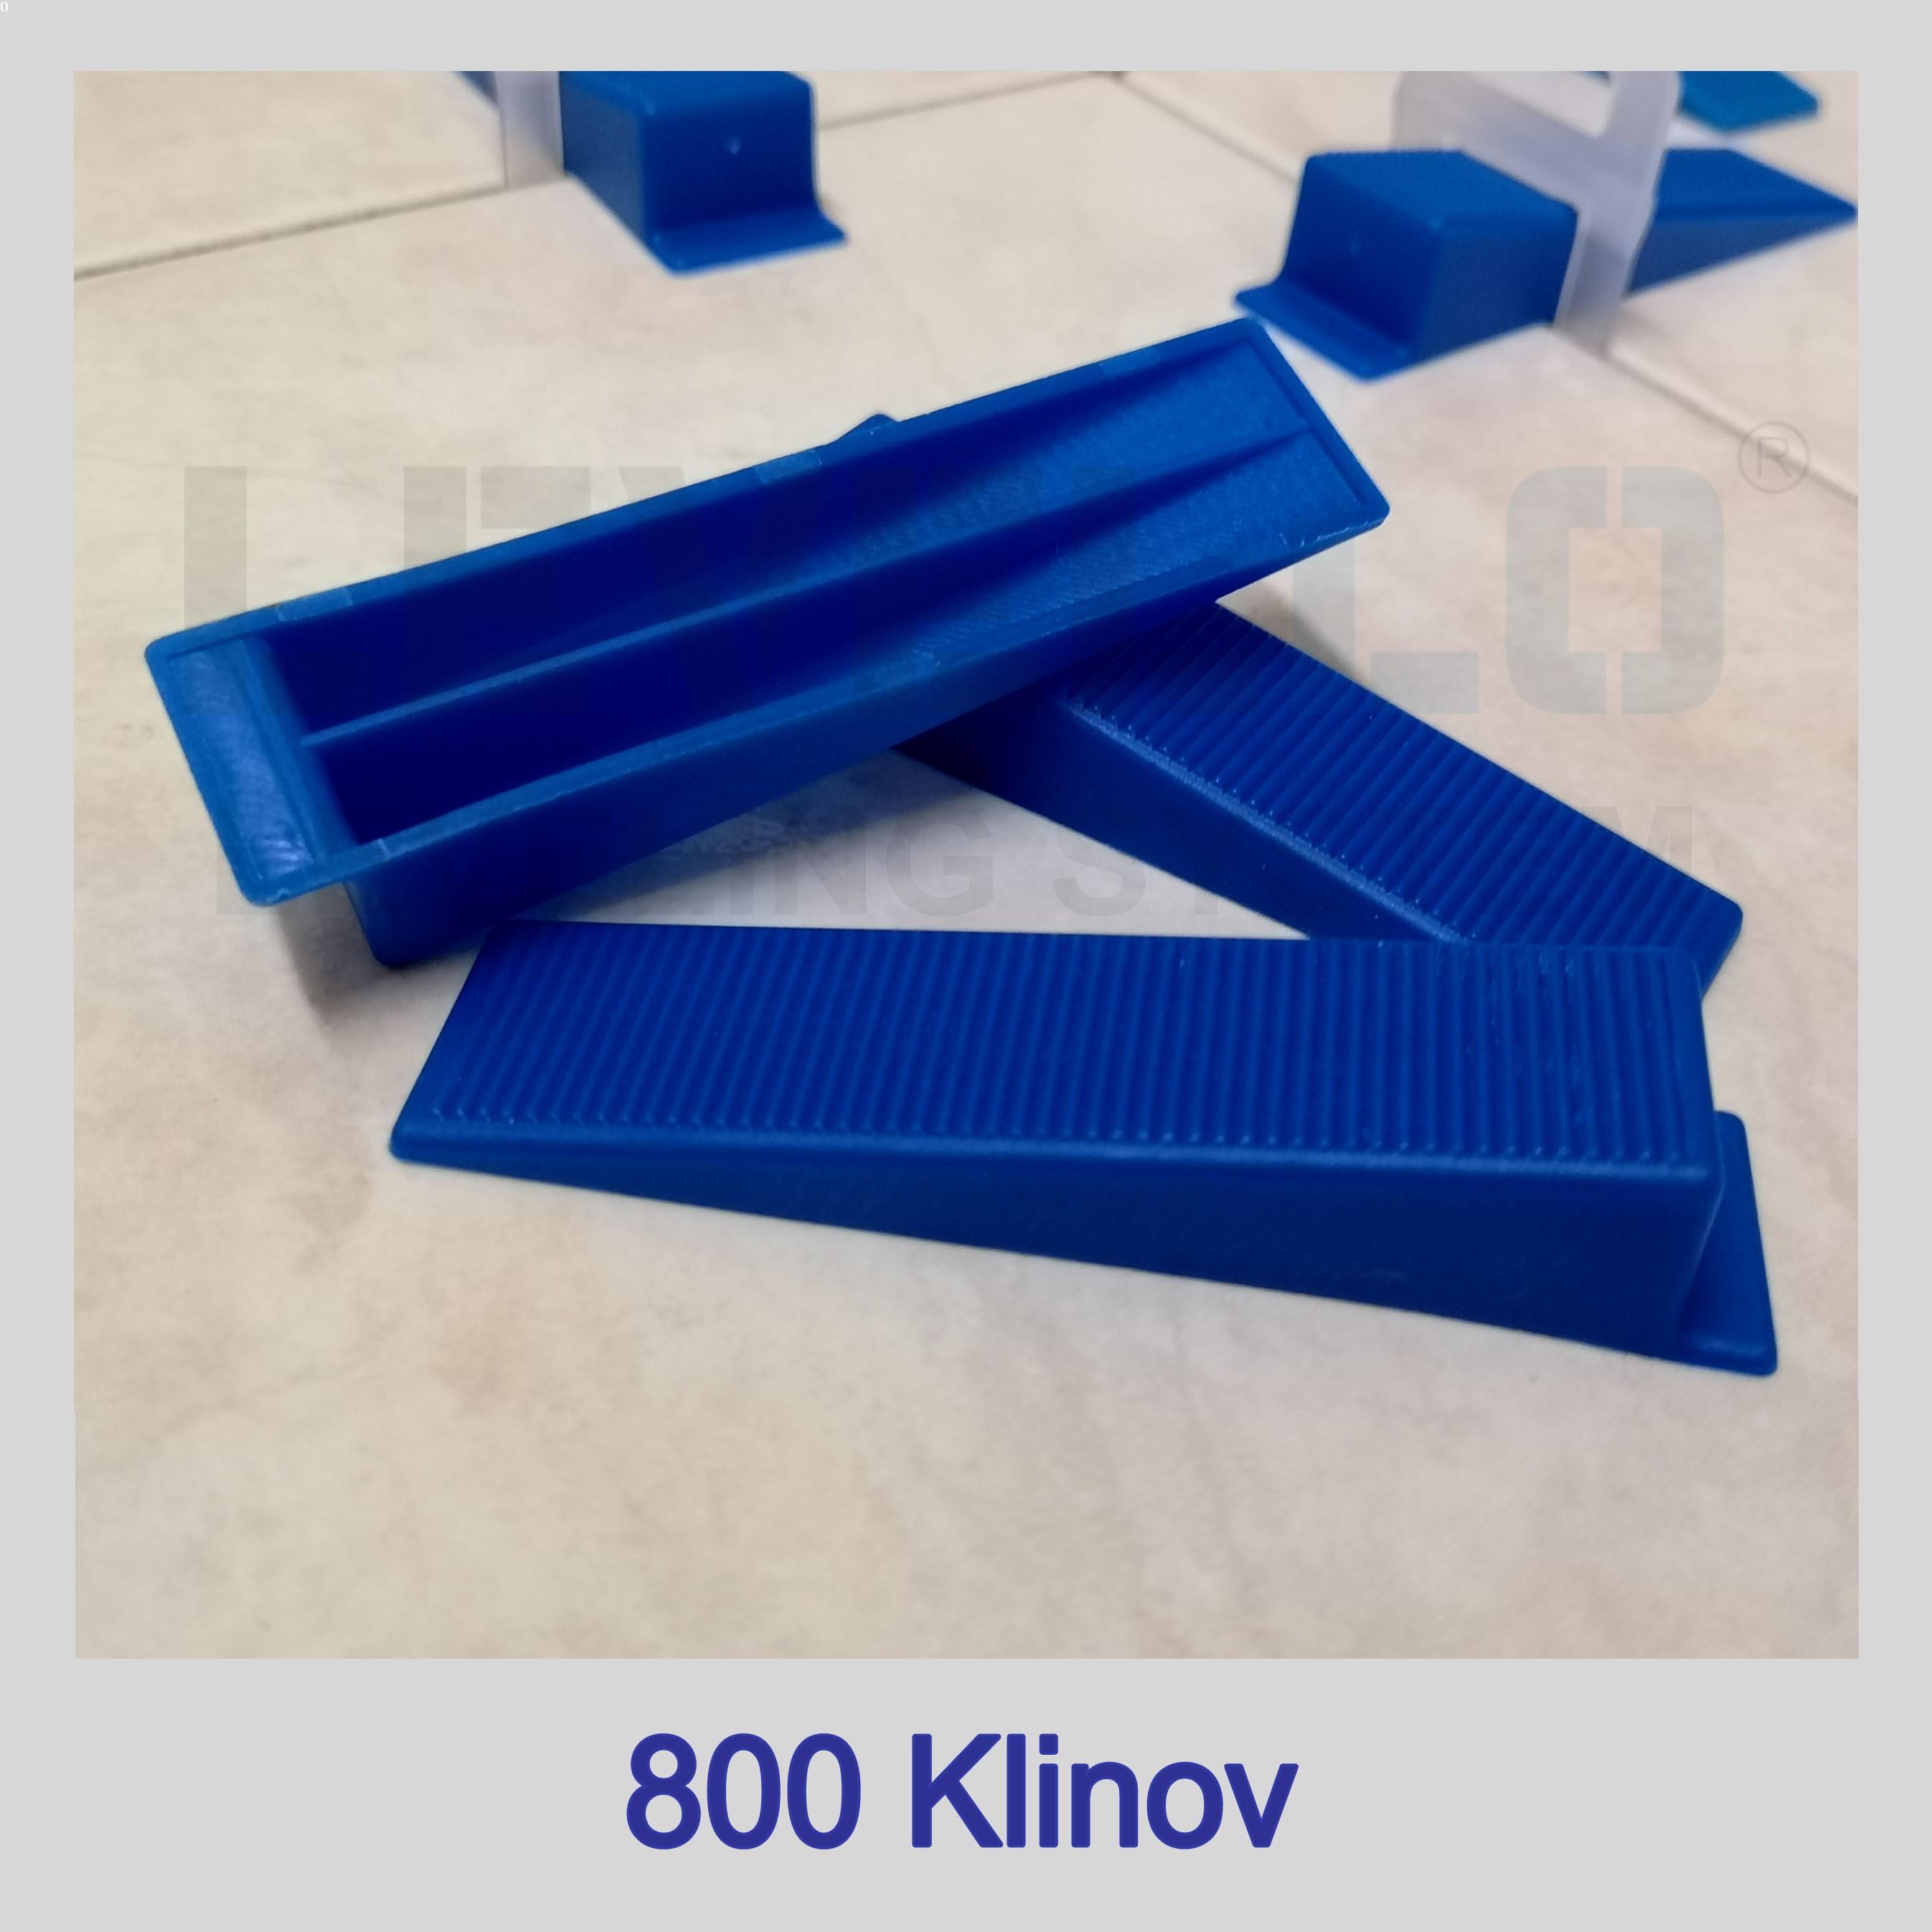 Nivelačné kliny modré, 800 kusov